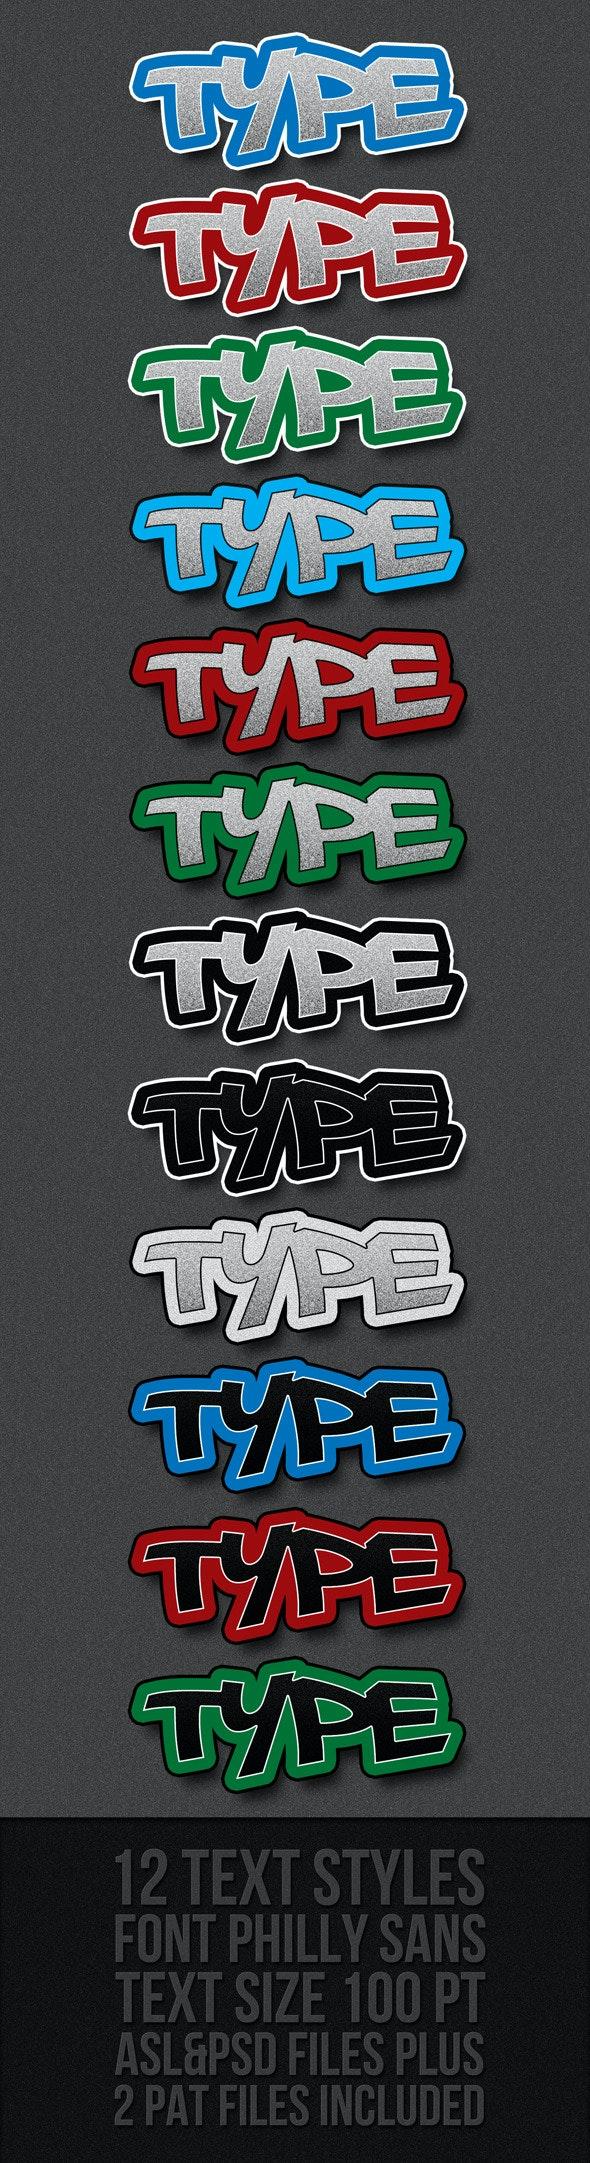 Graffiti Text Styles - Text Effects Styles